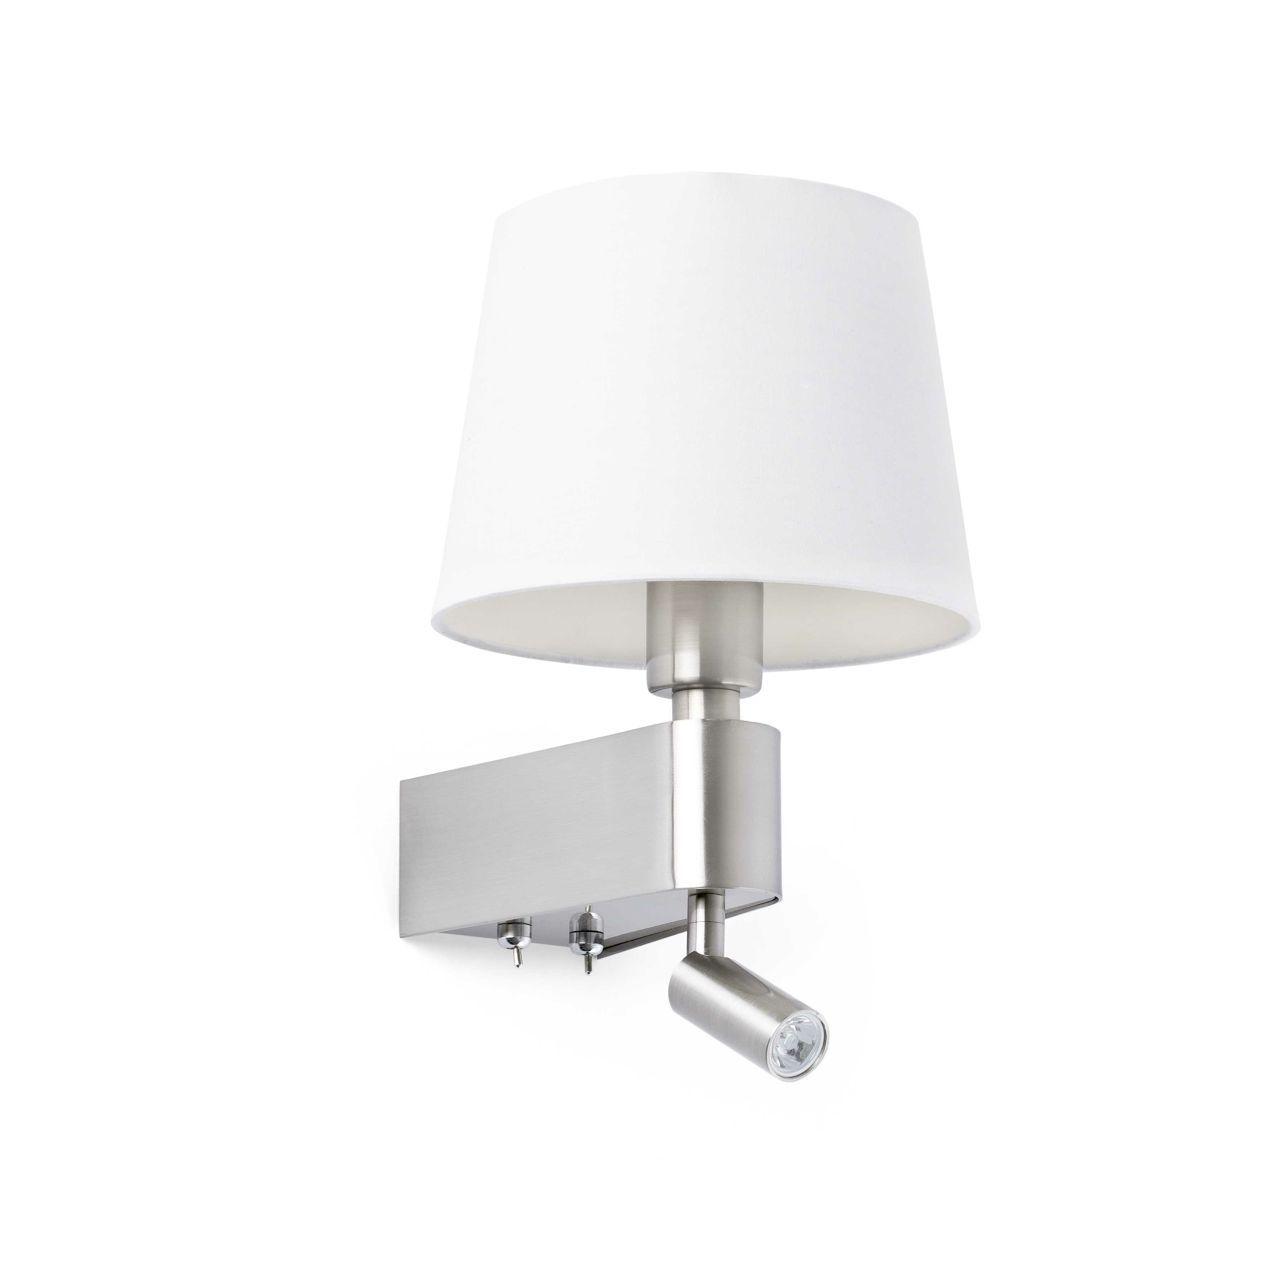 aplique de pared con lector de led iluminacion decoracion lamparas diseo